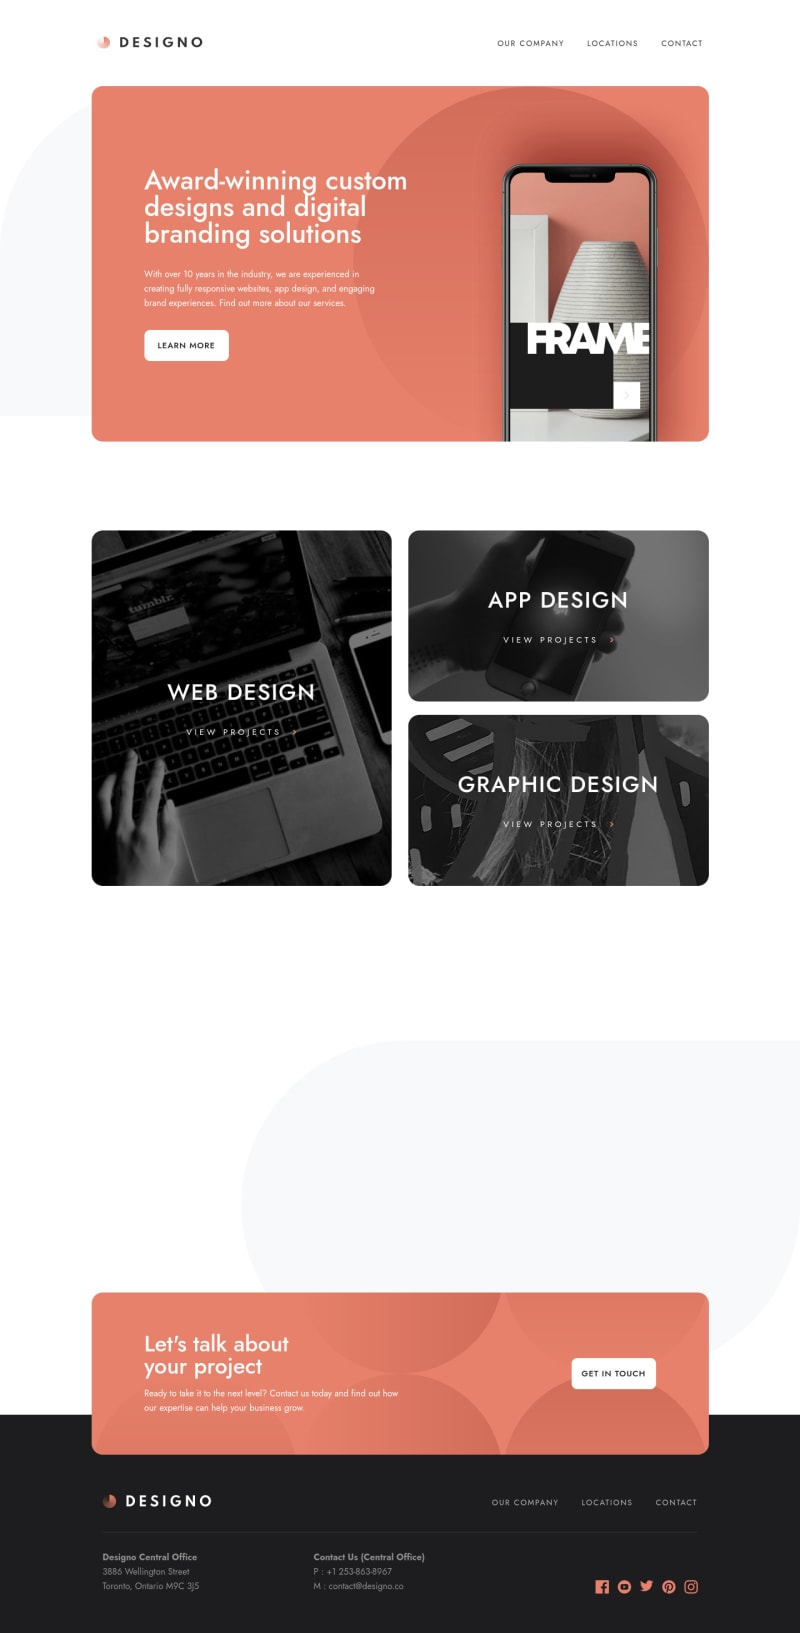 Desktop design screenshot for the Designo multi-page website coding challenge